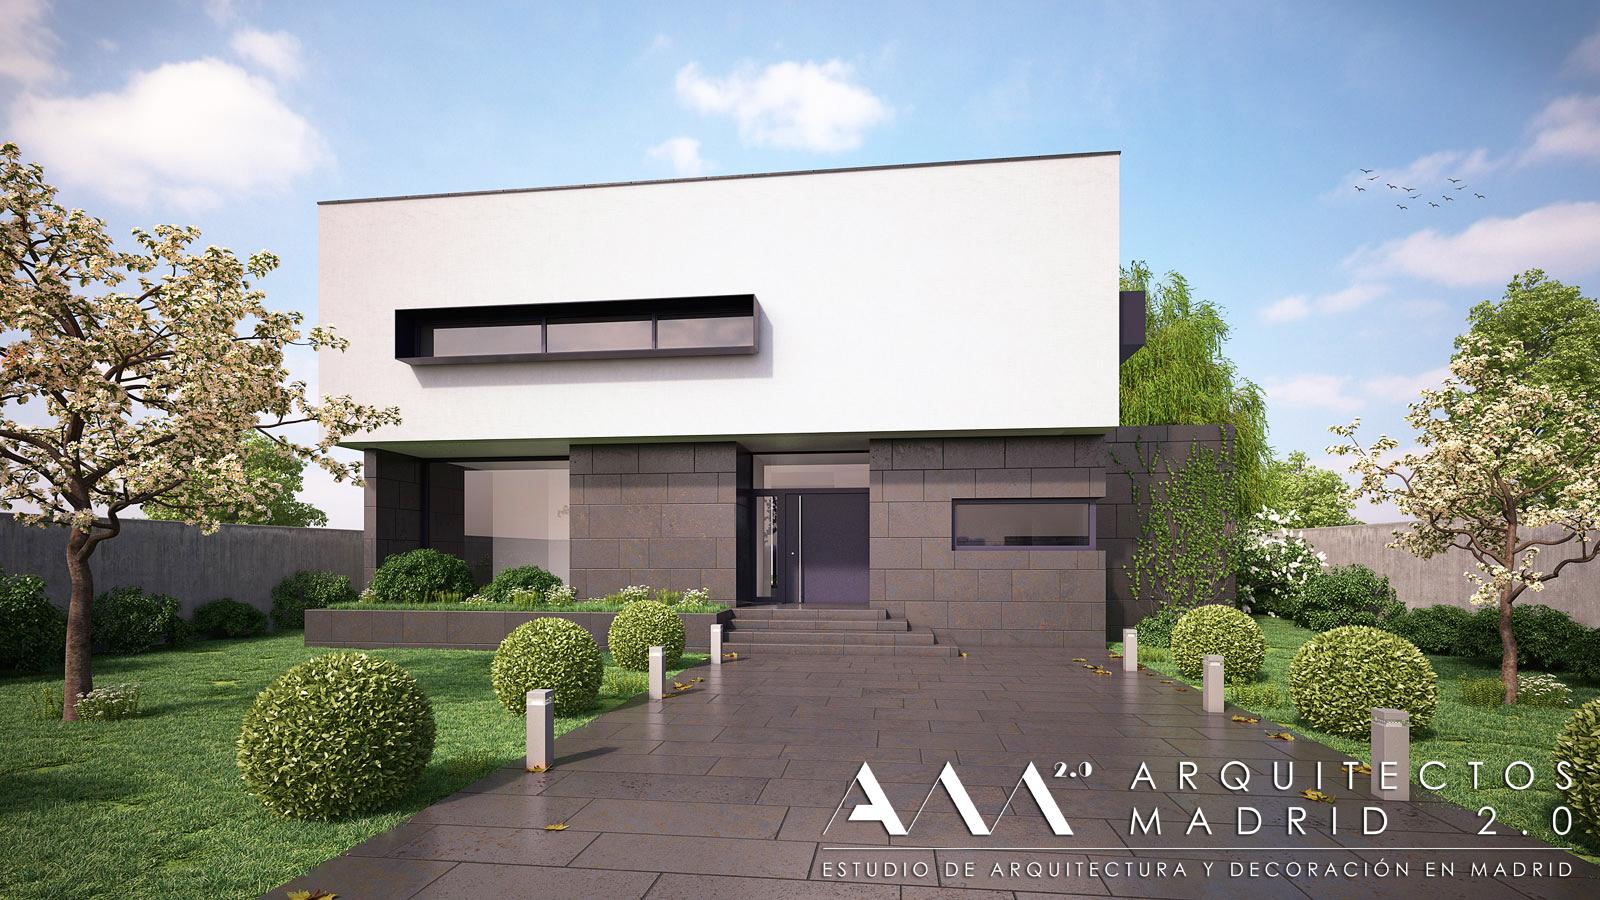 Proyecto y construcci n de casa moderna viviendas de for Fachadas de casas ultramodernas